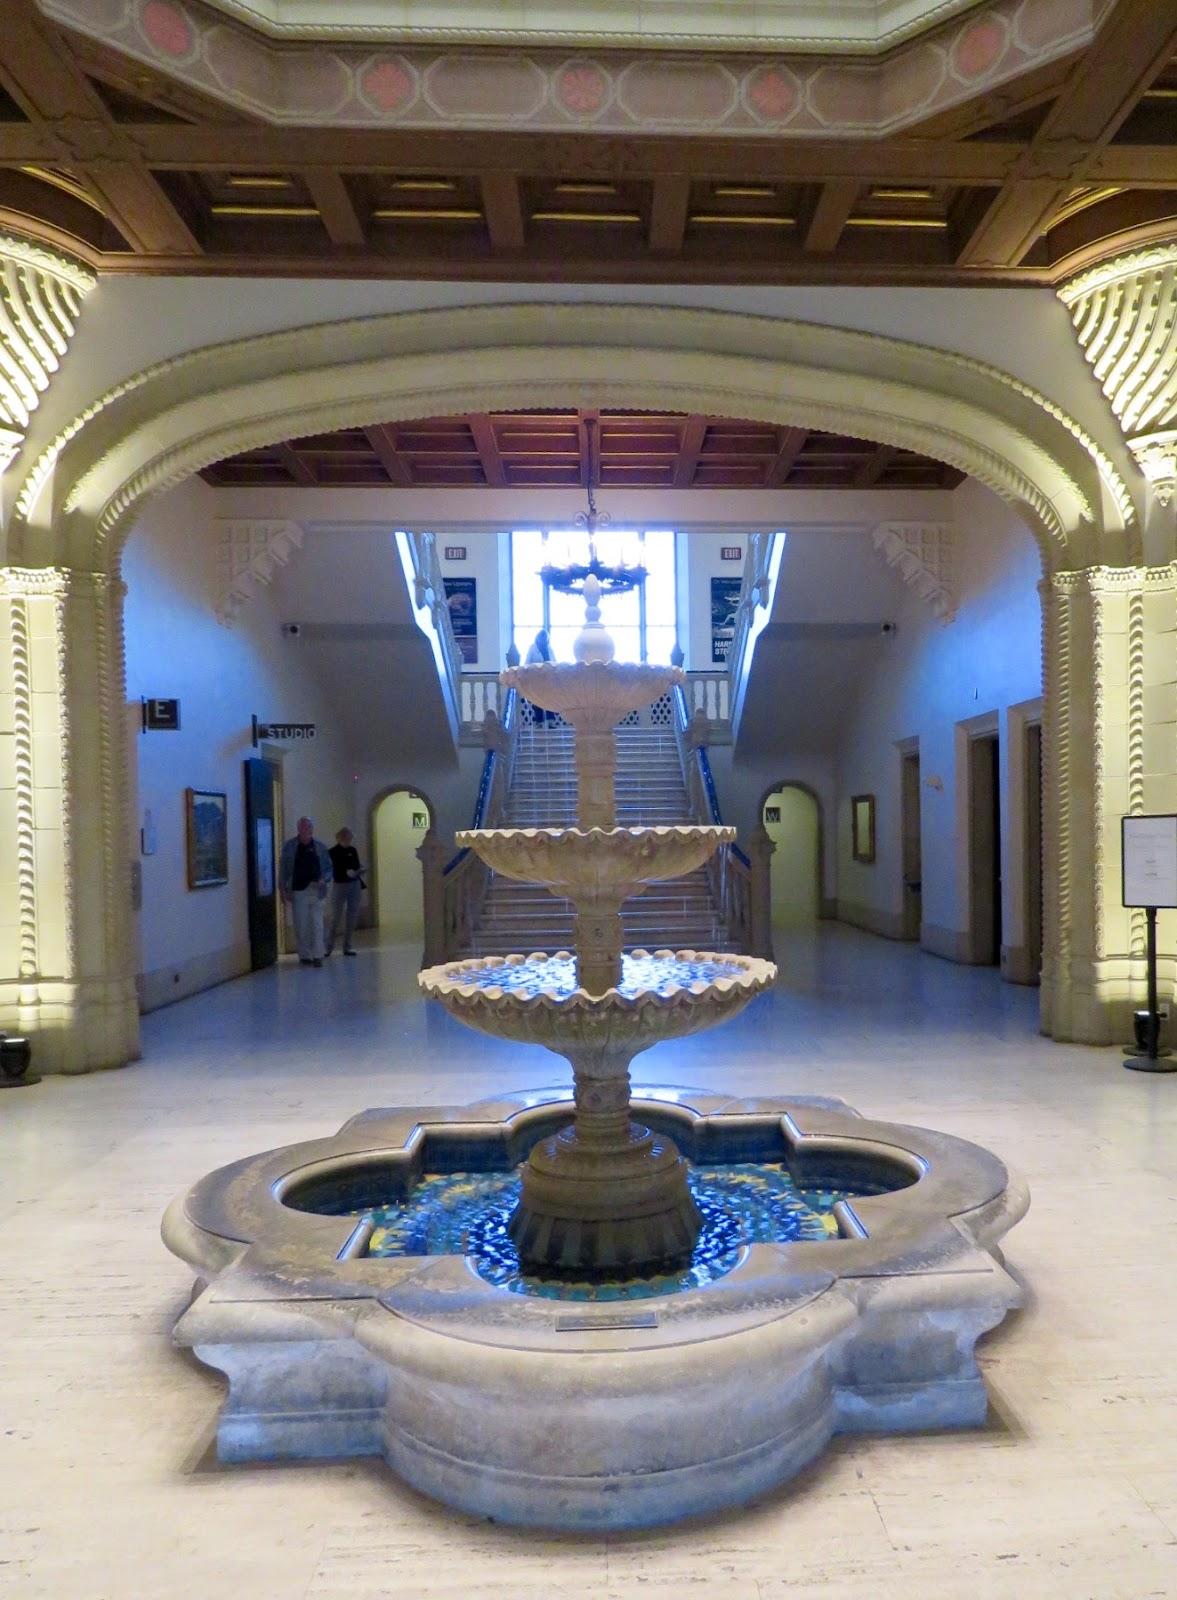 San antonio museum of art asian